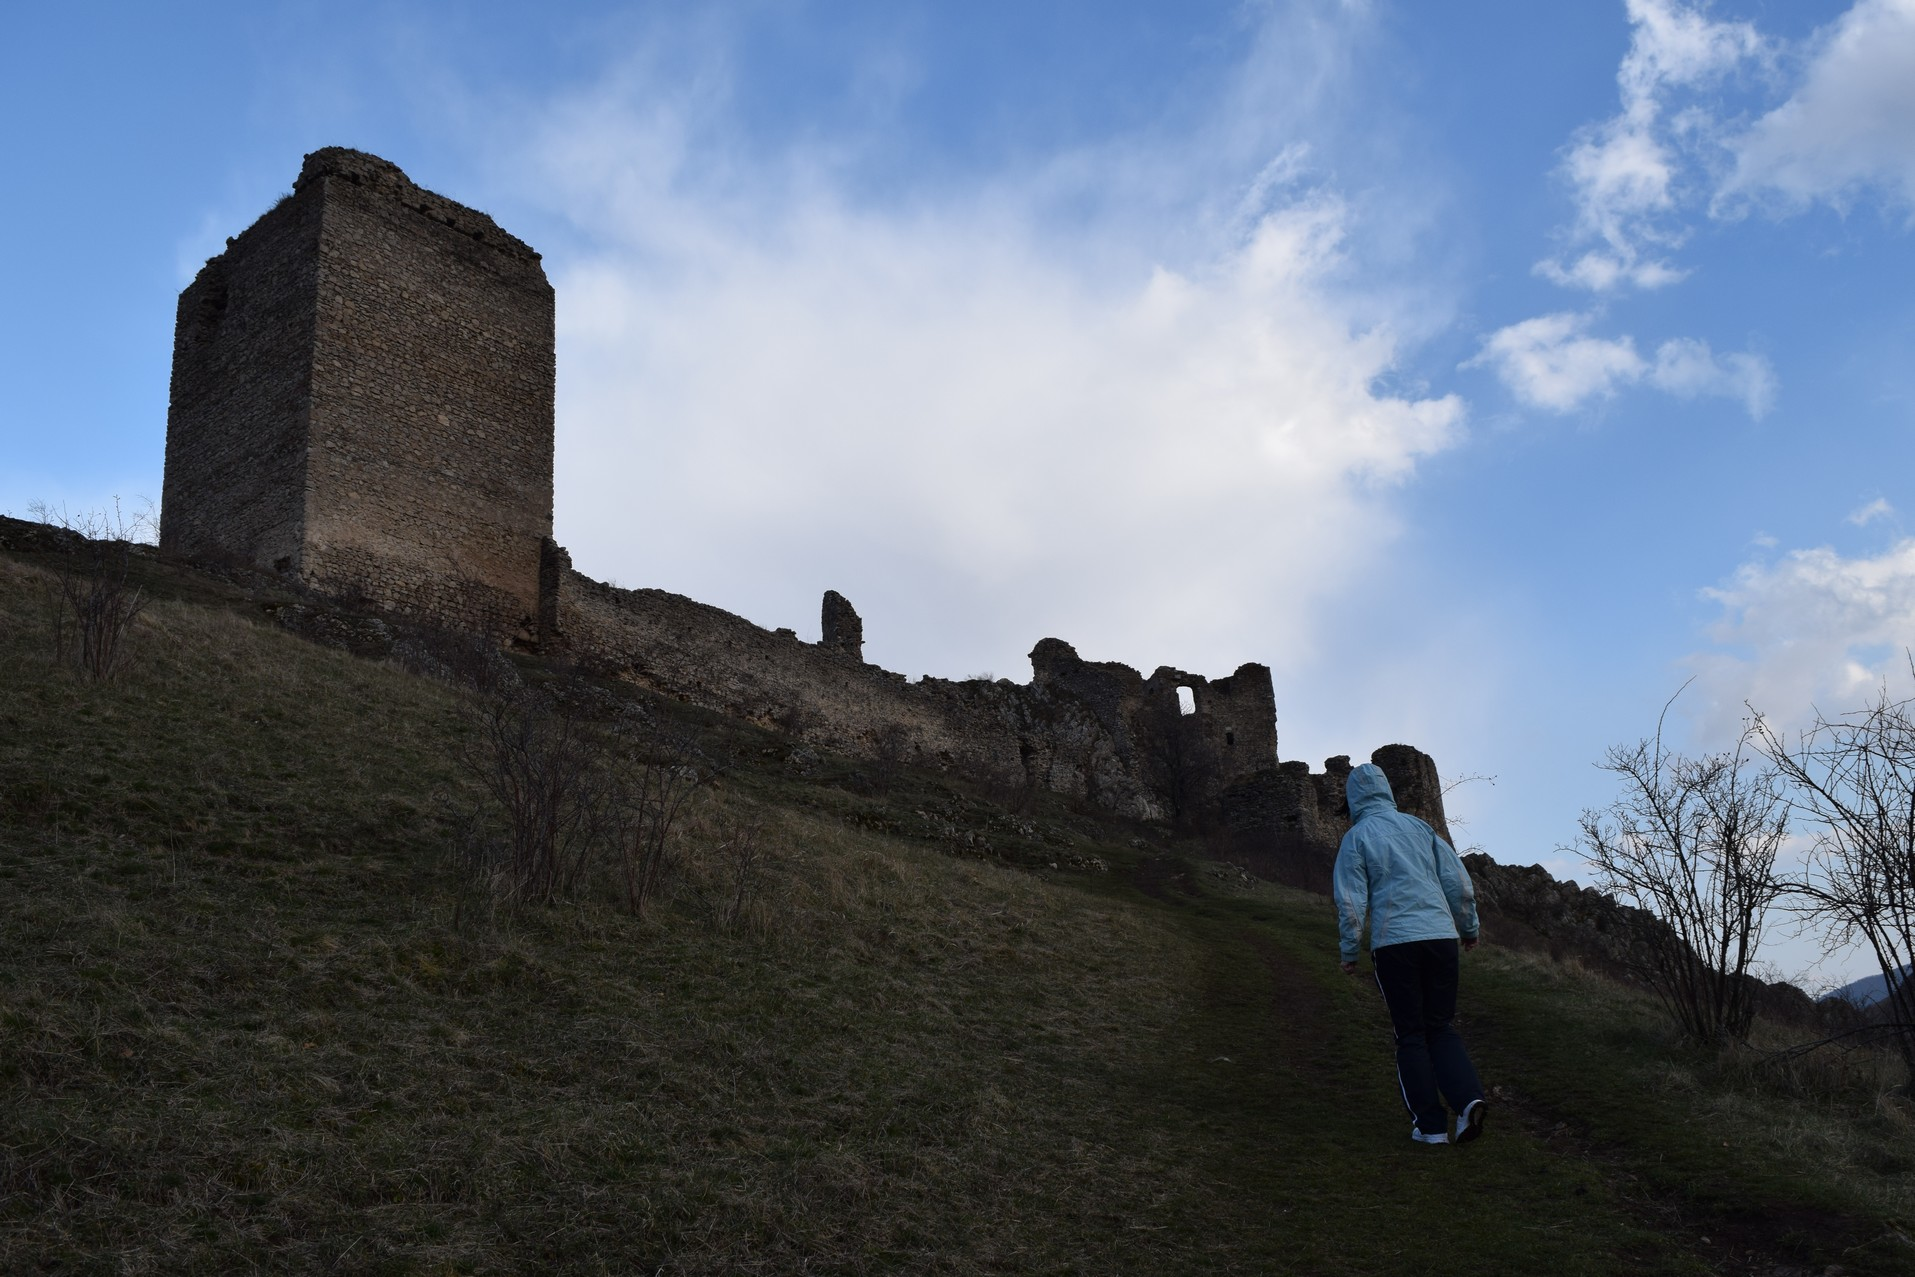 Voyage en Roumanie Citadelle Trascau Coltesti